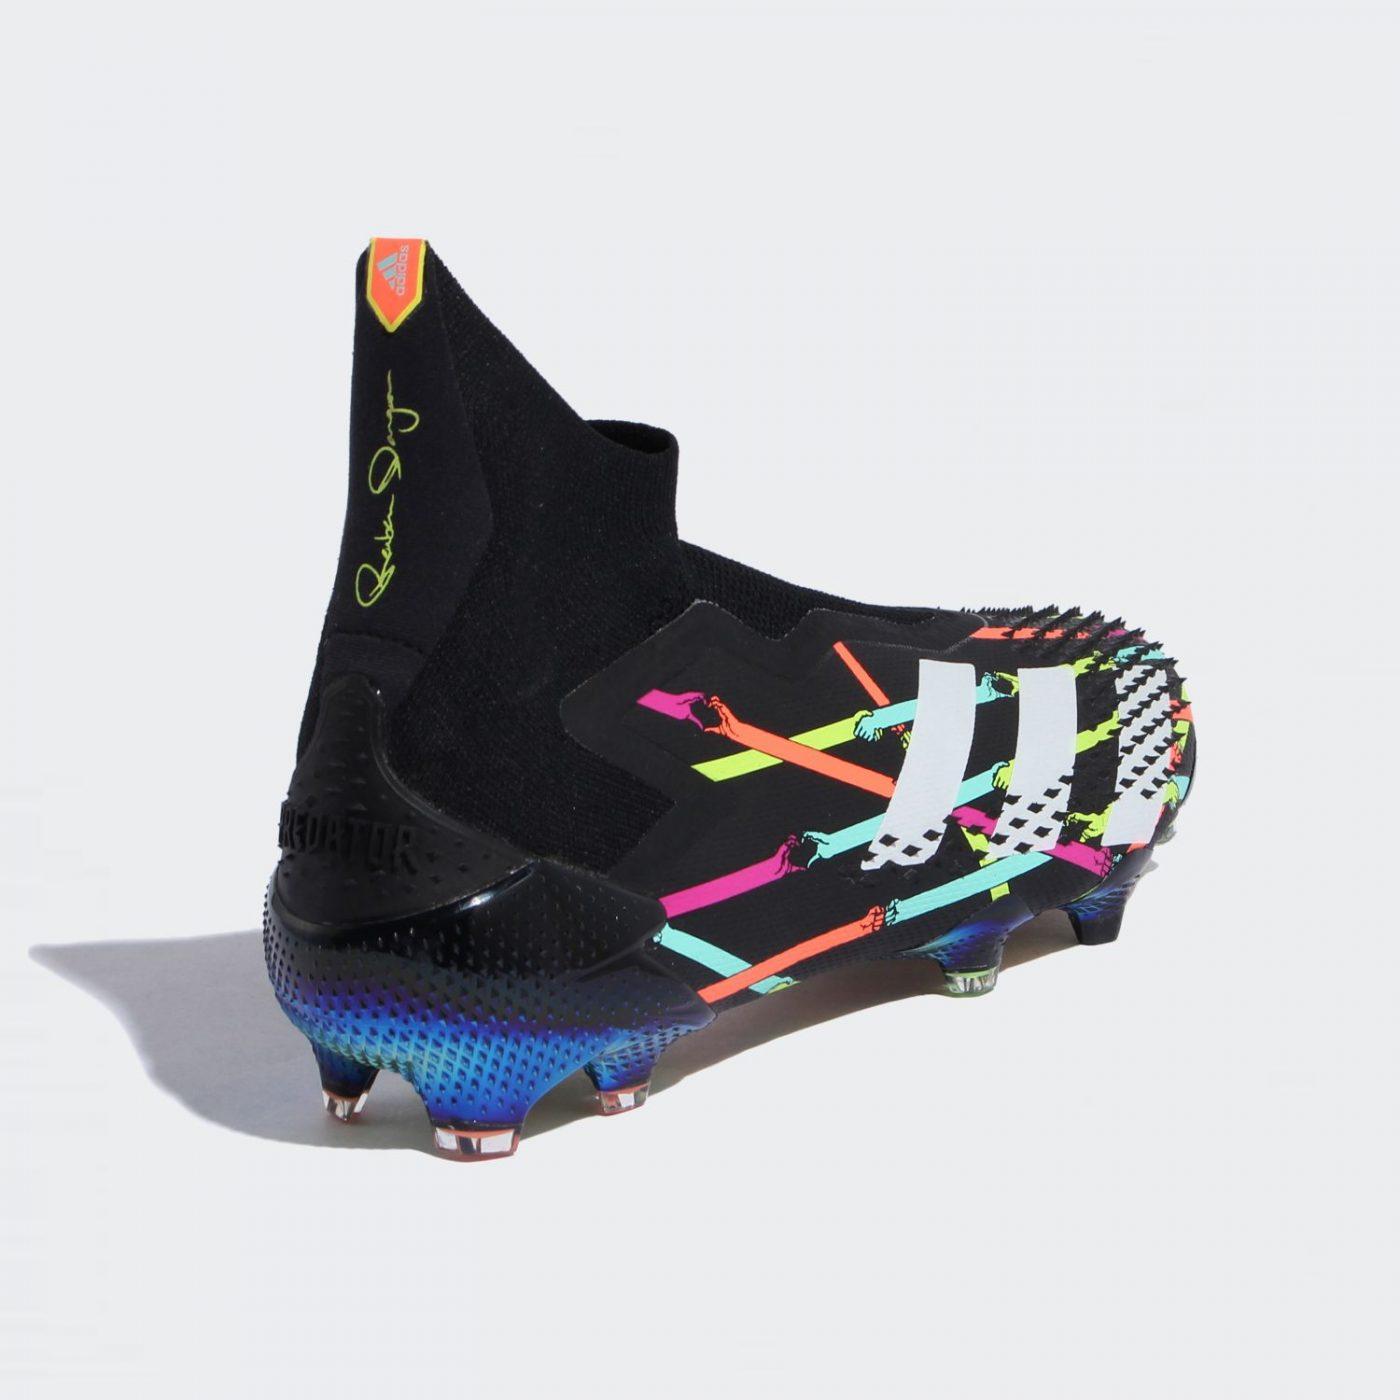 adidas-predator-20-mutator-art-firm-japon-3